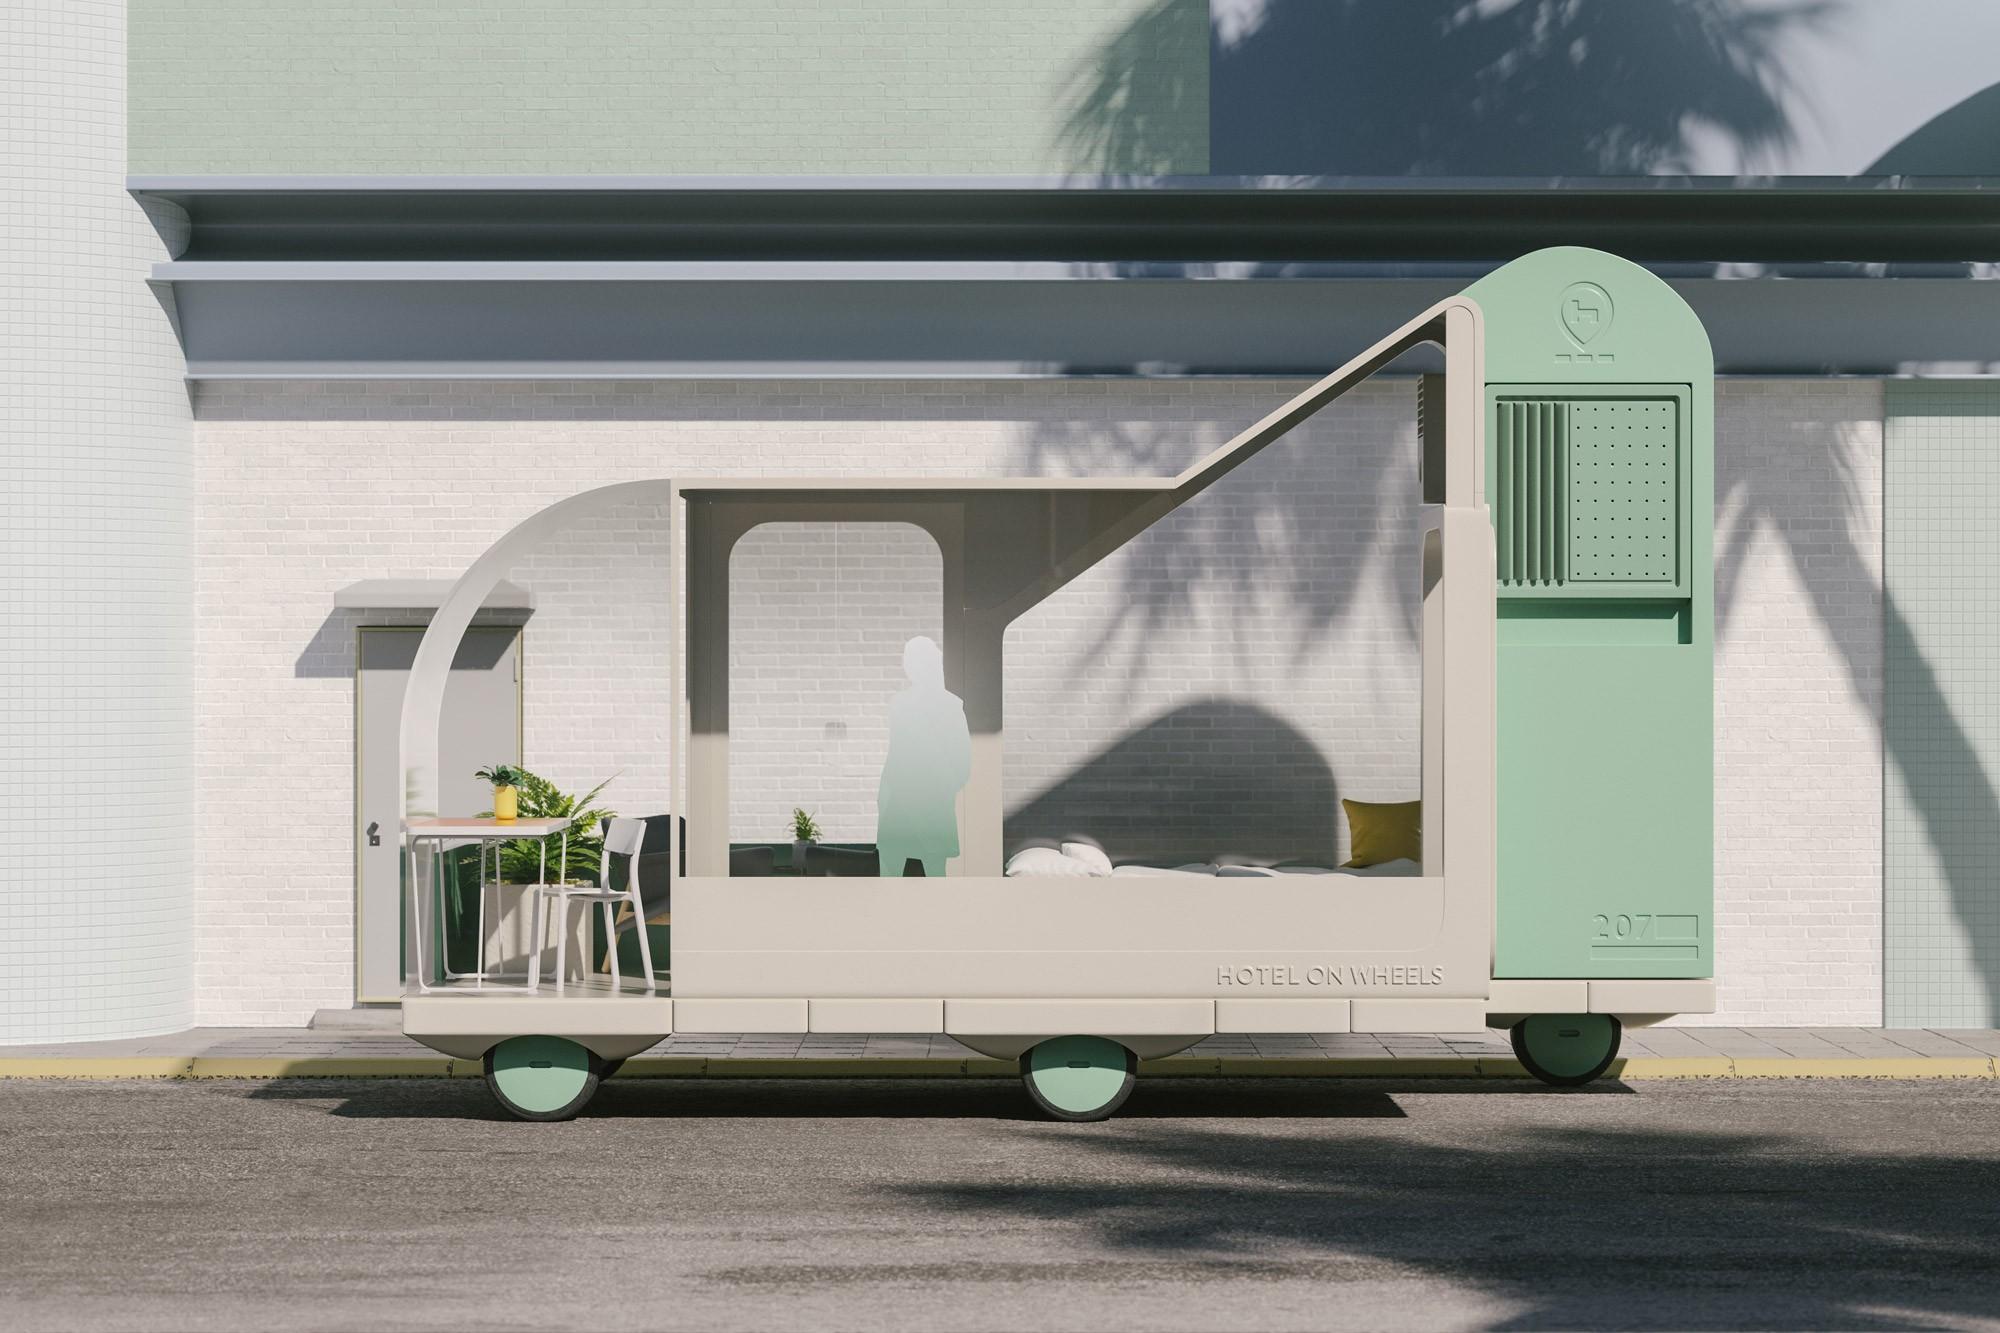 Hotel on Wheels